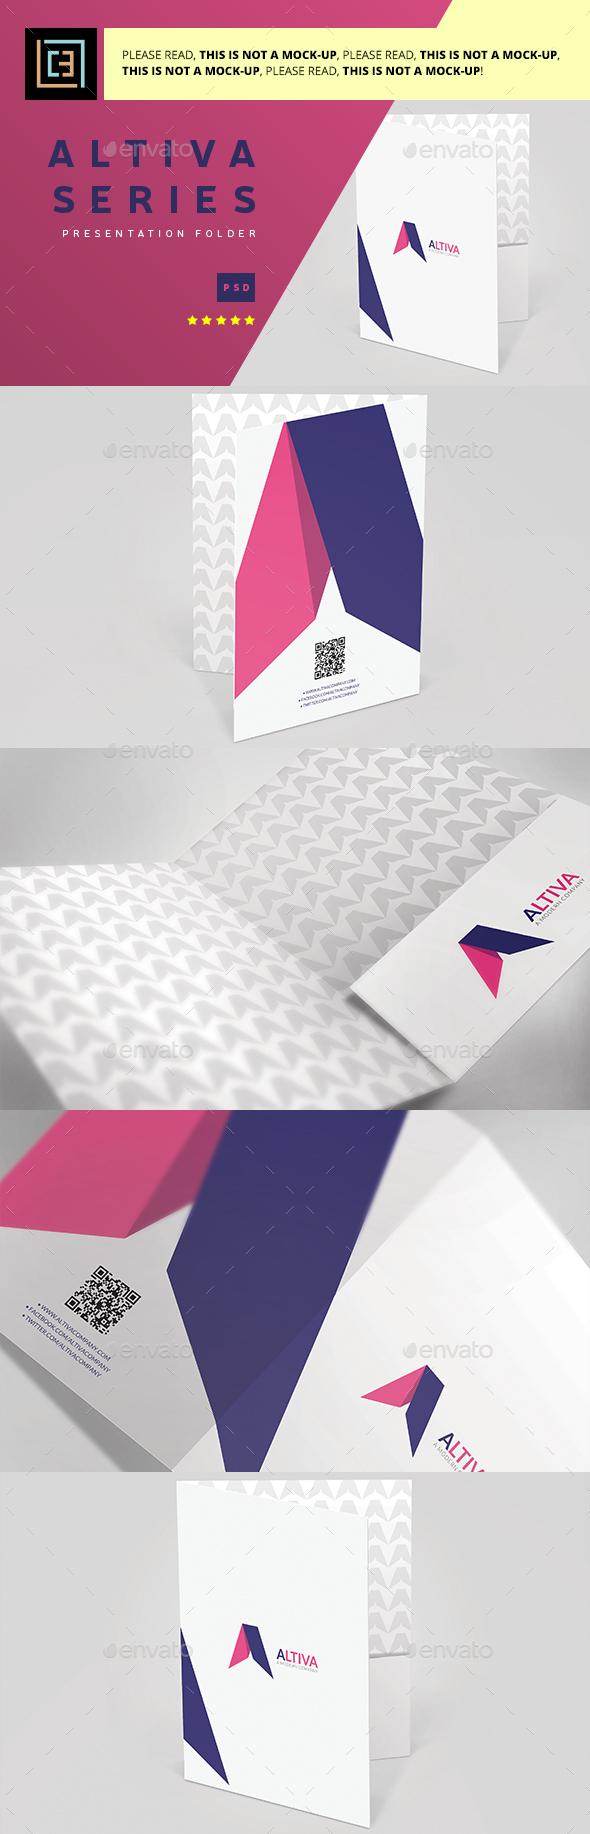 Altiva Series - Presentation Folder - Stationery Print Templates